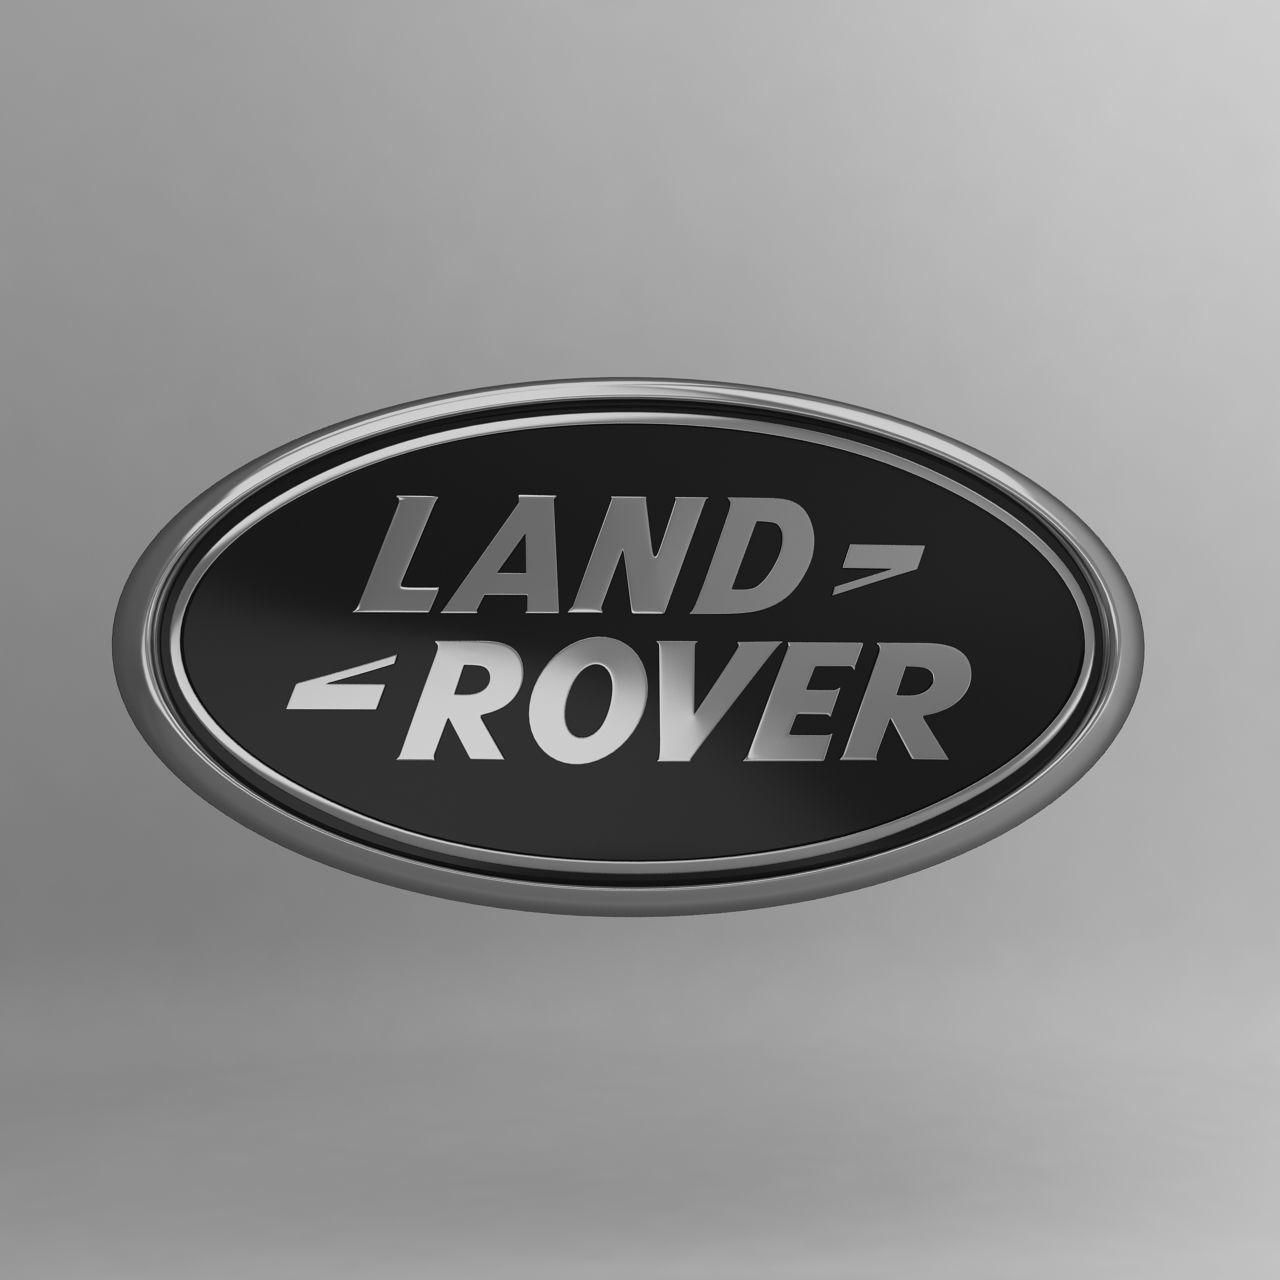 Land Rover Car Logo Keychain 3d Model Cgtrader